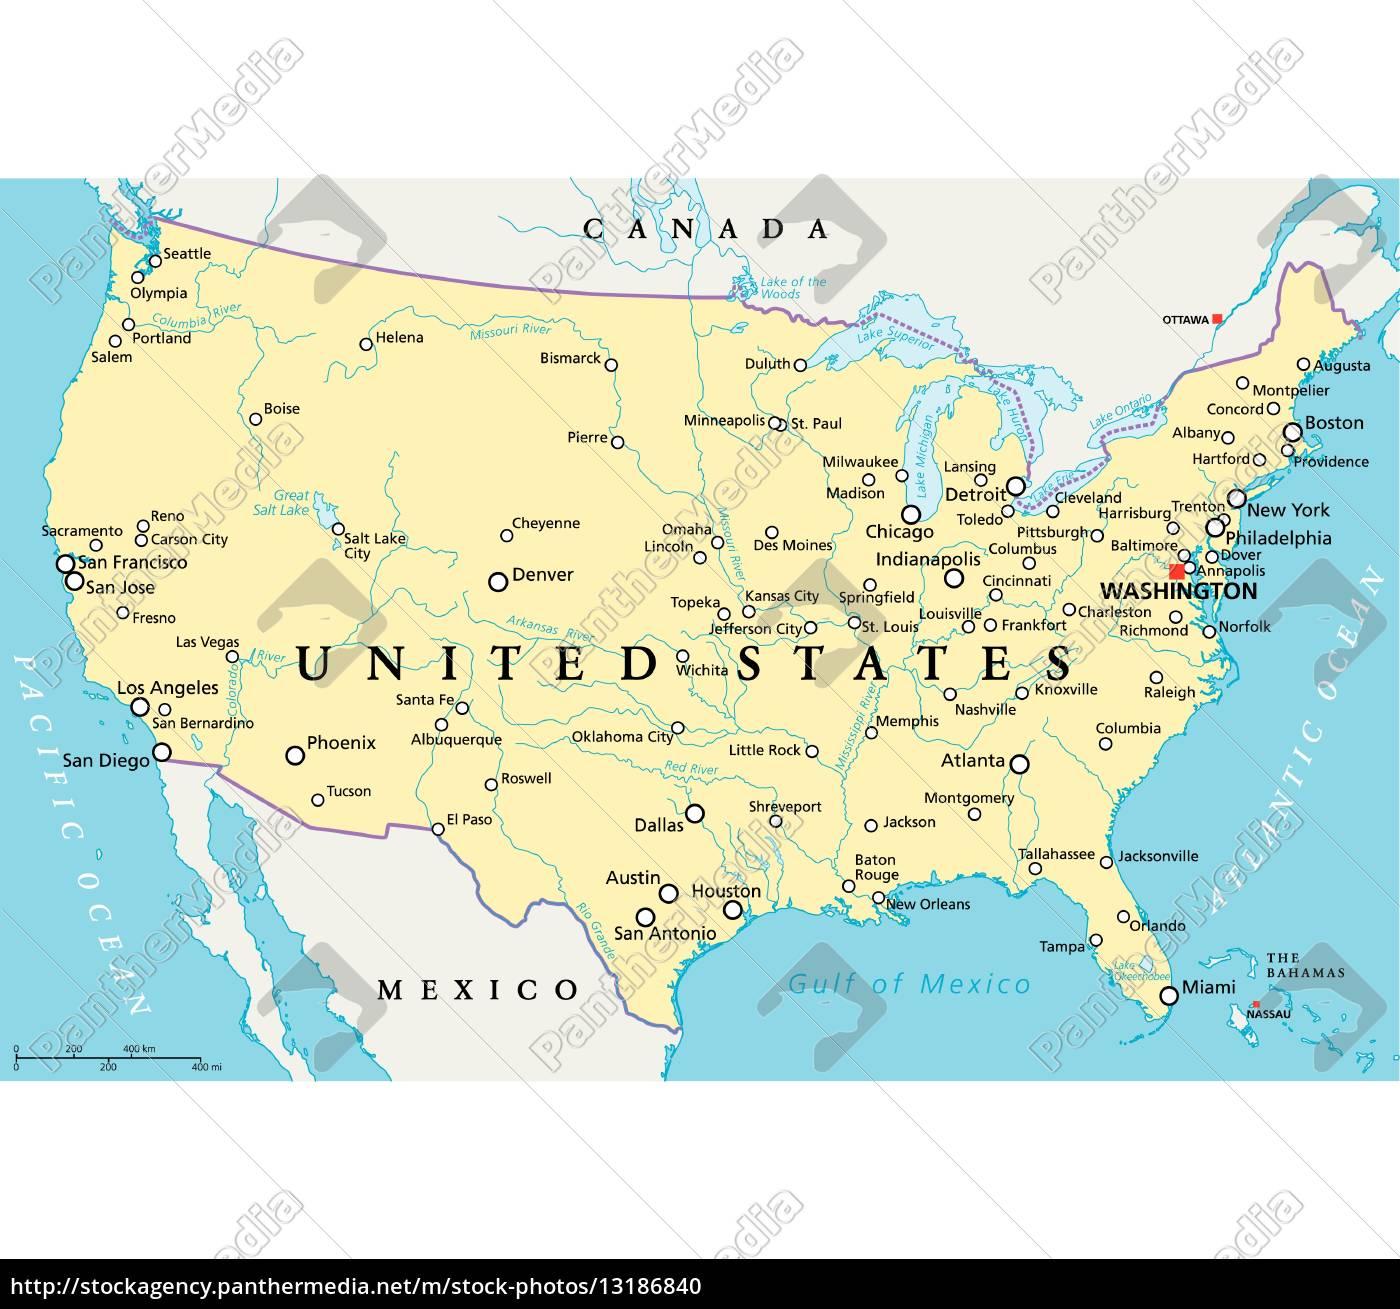 united states of america political map - Lizenzfreies Foto ...